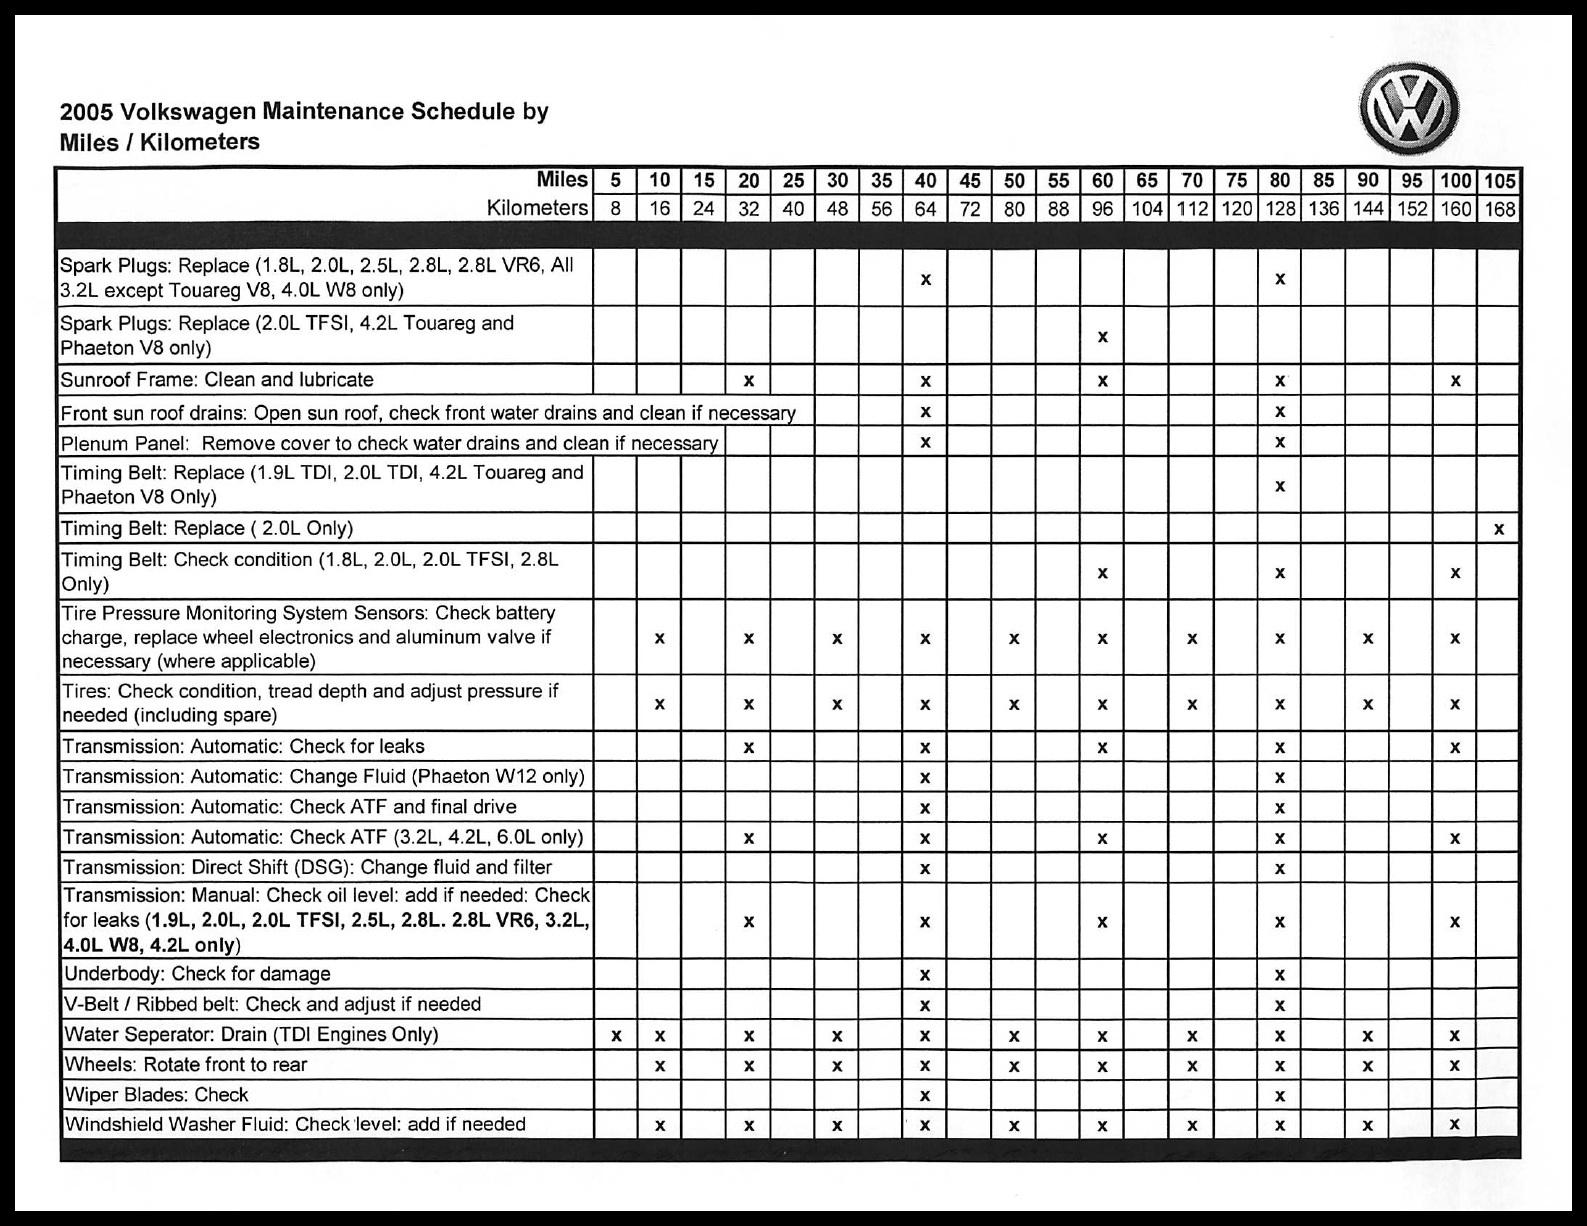 Maintenance Schedule for 2007 toyota Camry Fresh Tamerlane S thoughts Volkswagen Maintenance Schedule 2005 Model Year